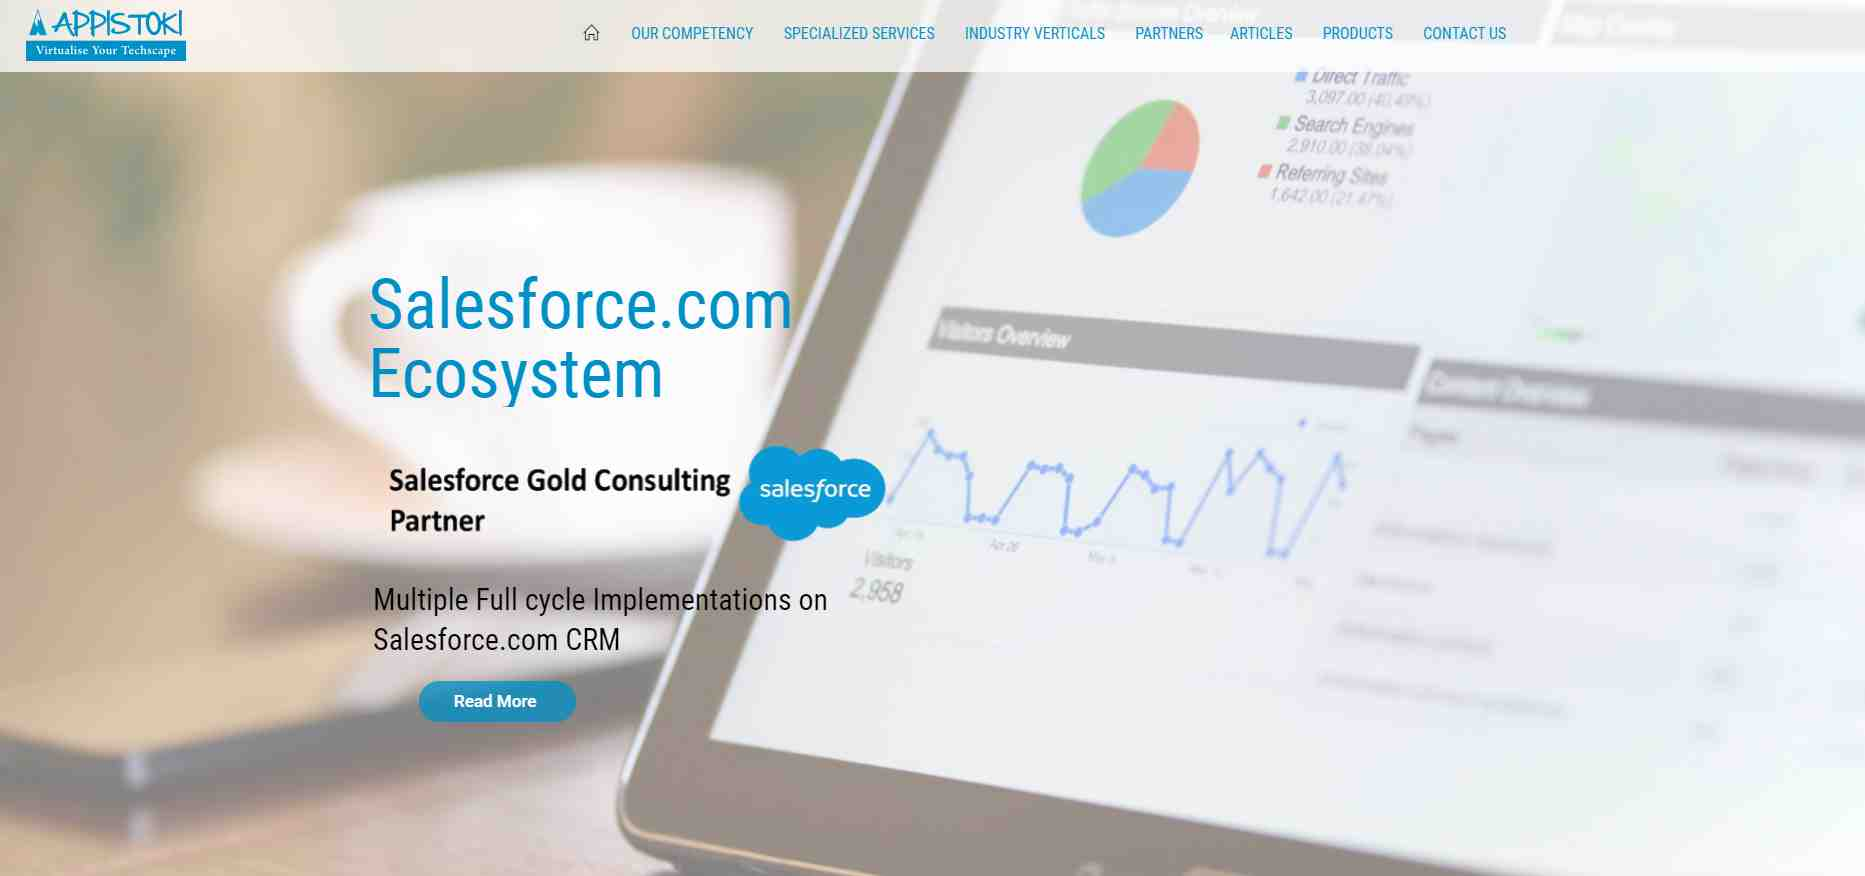 appistoki Top Salesforce Consultants in Singapore